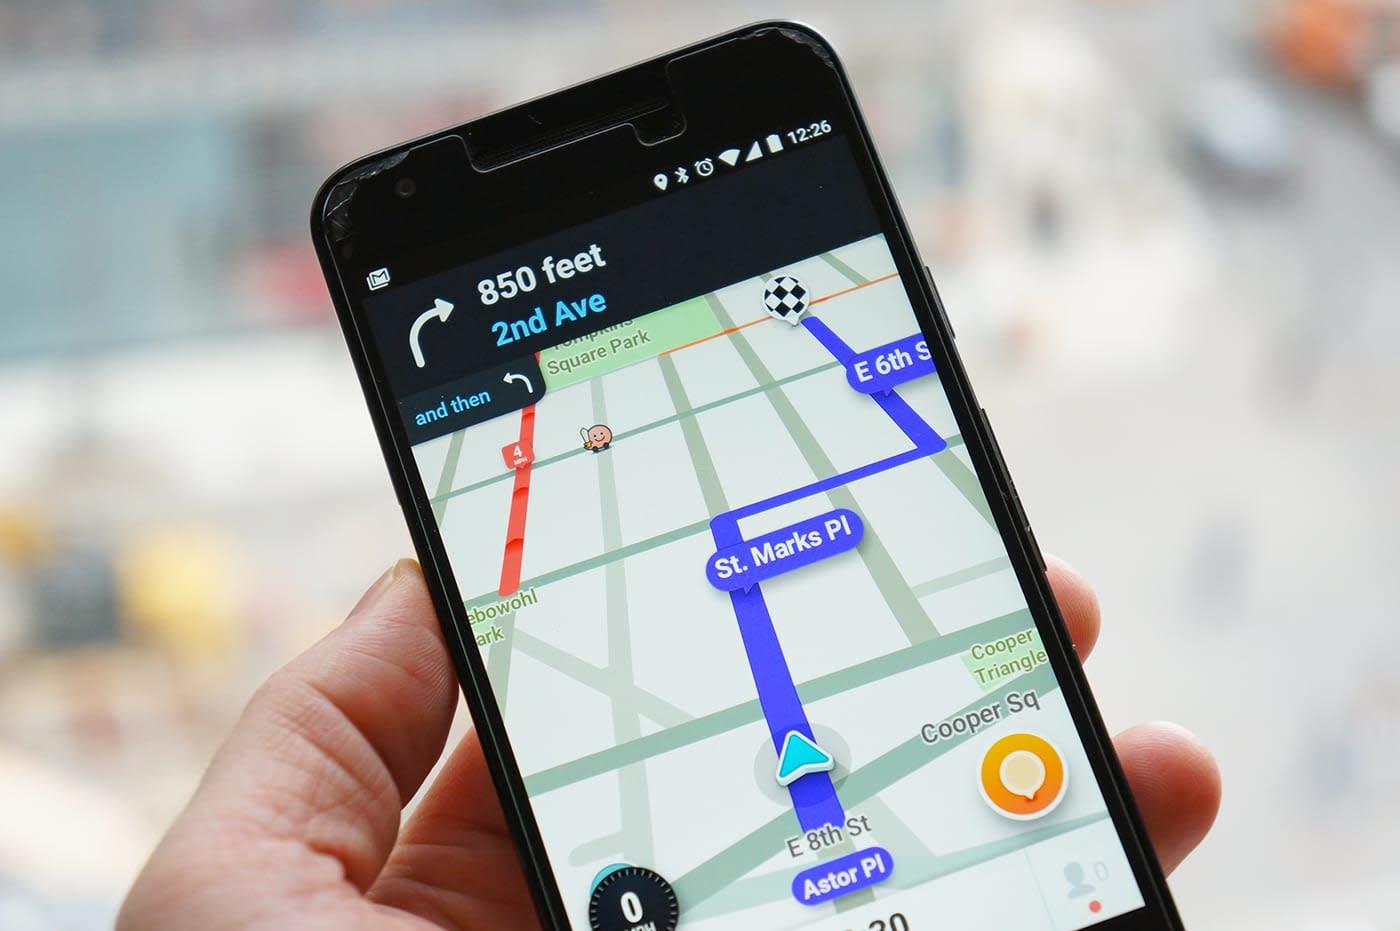 Waze hack lets creeps track your driving